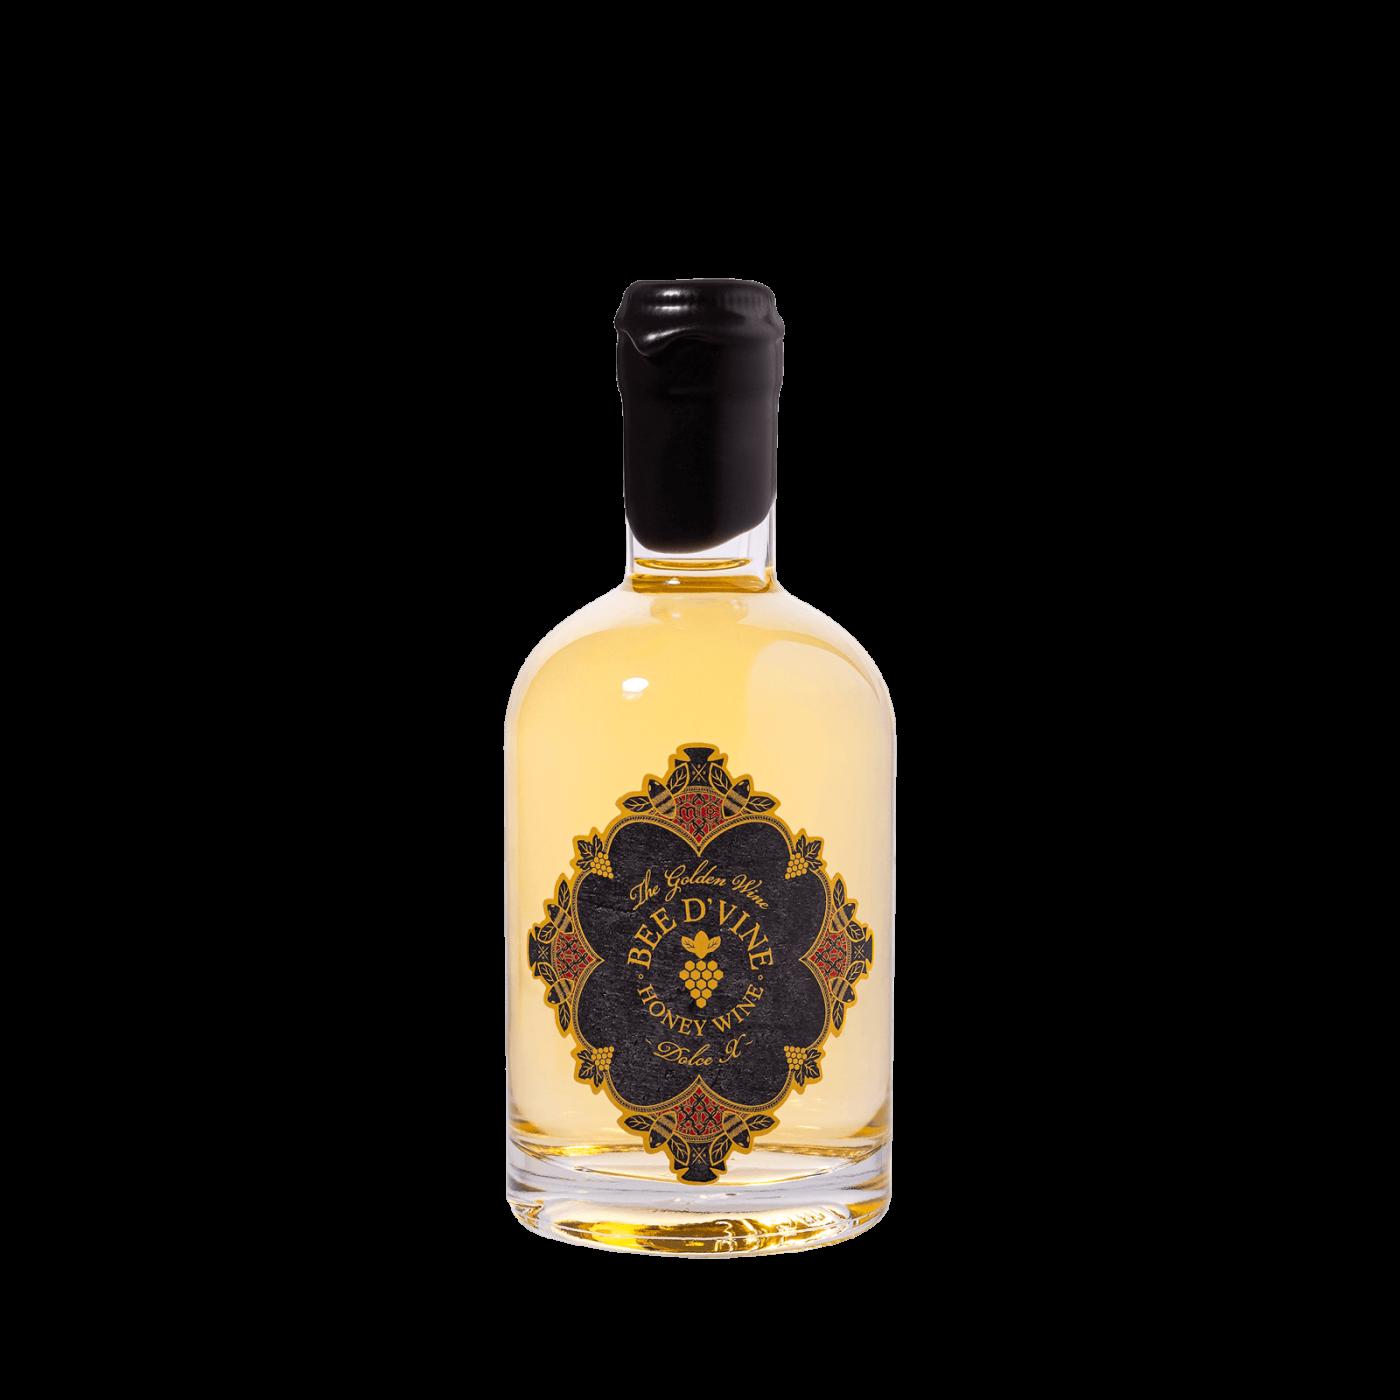 Dolce X Reserve Honey Wine